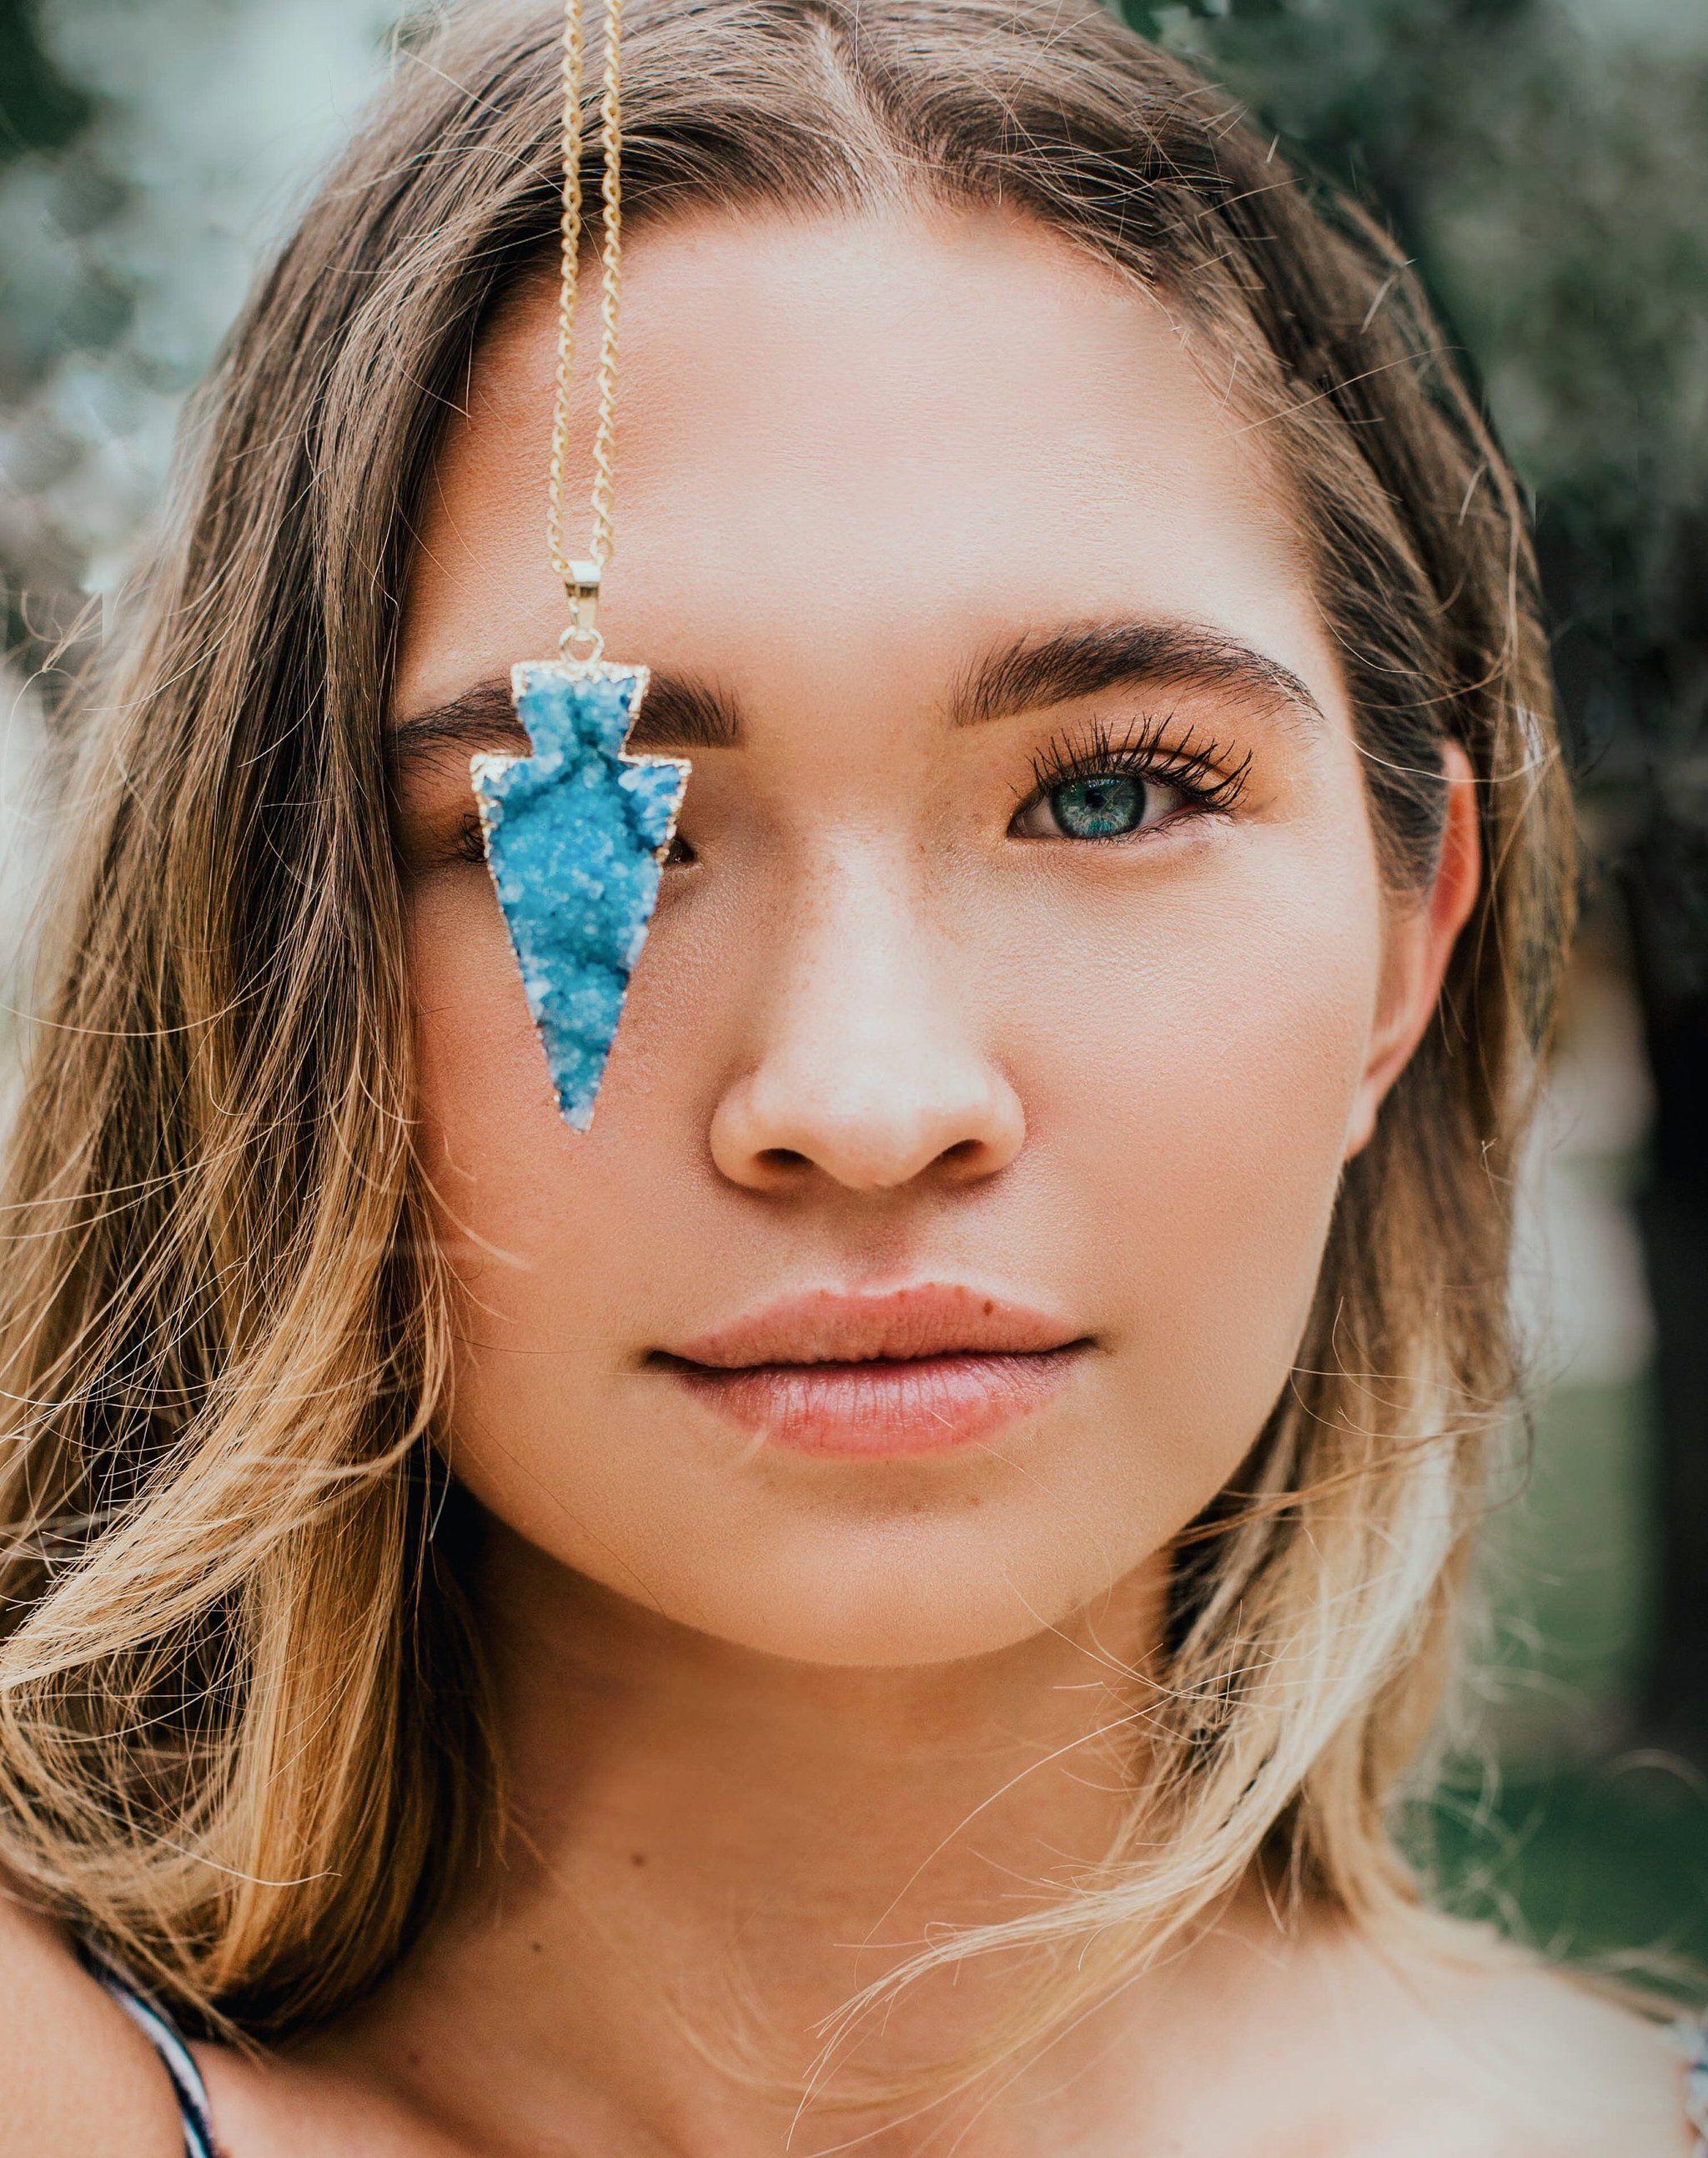 Photo of Blue Druzy Arrowhead Necklace